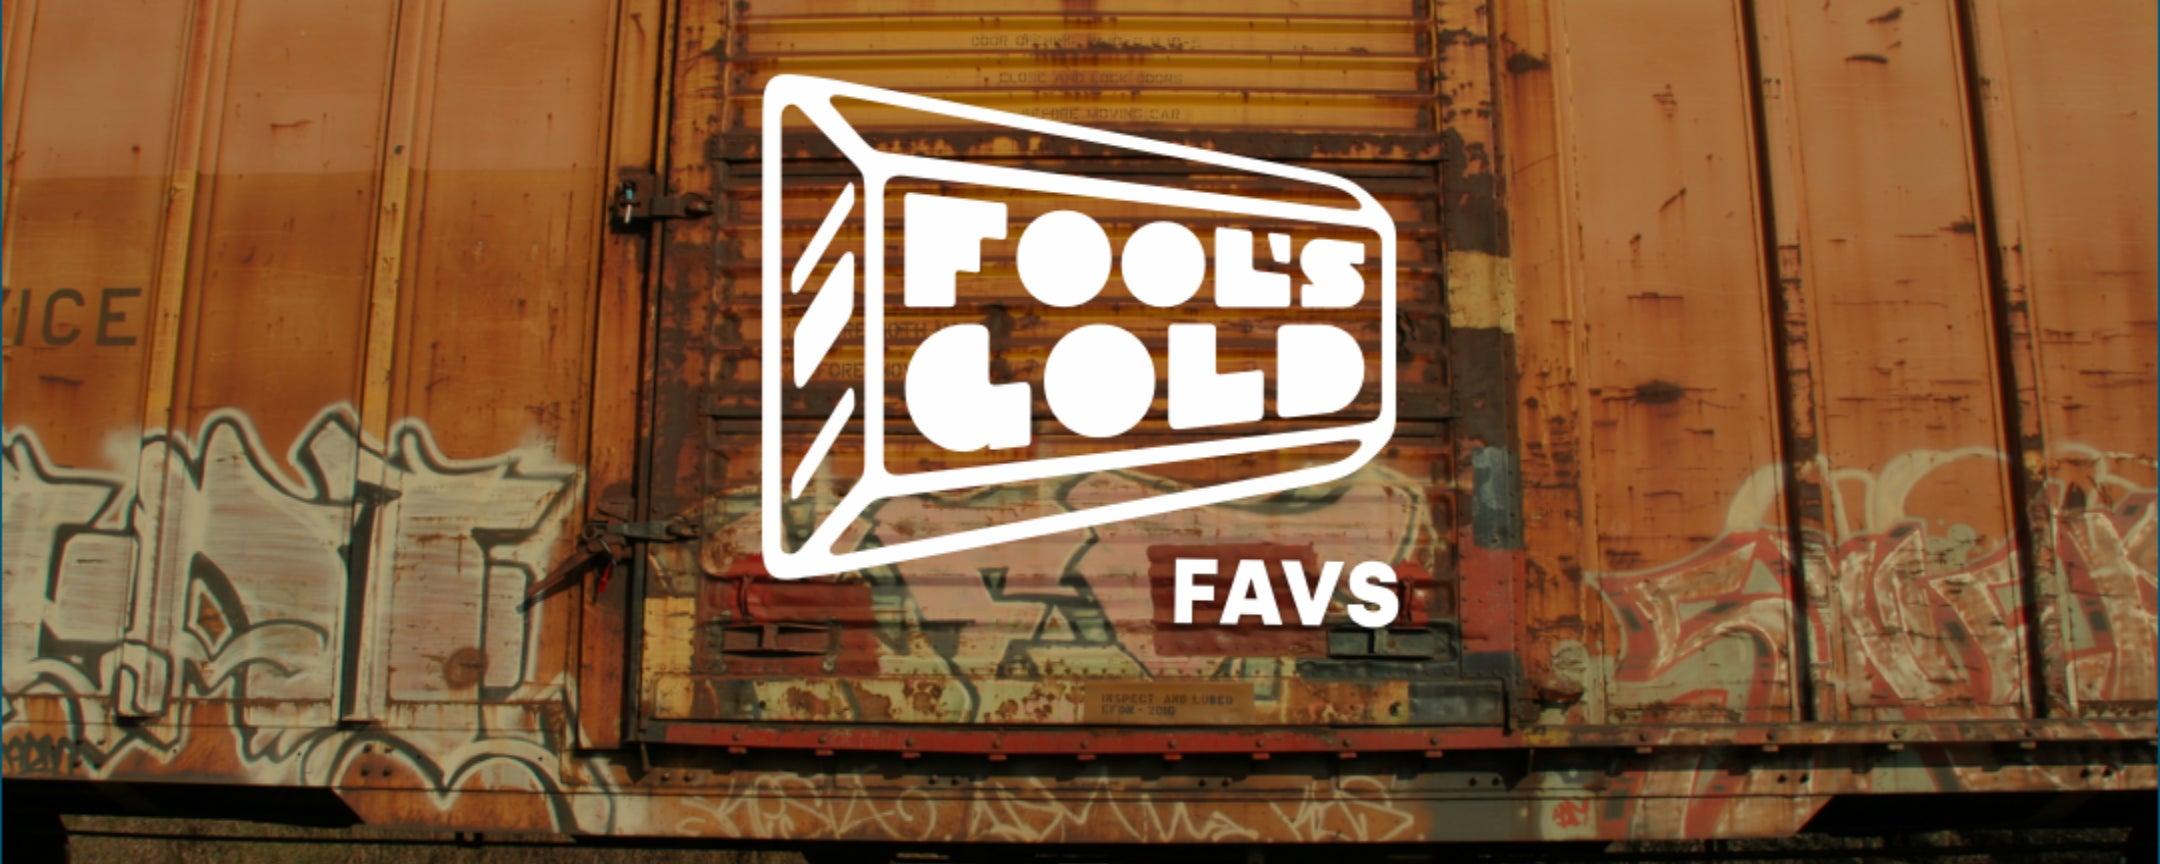 Fool's Gold Favs